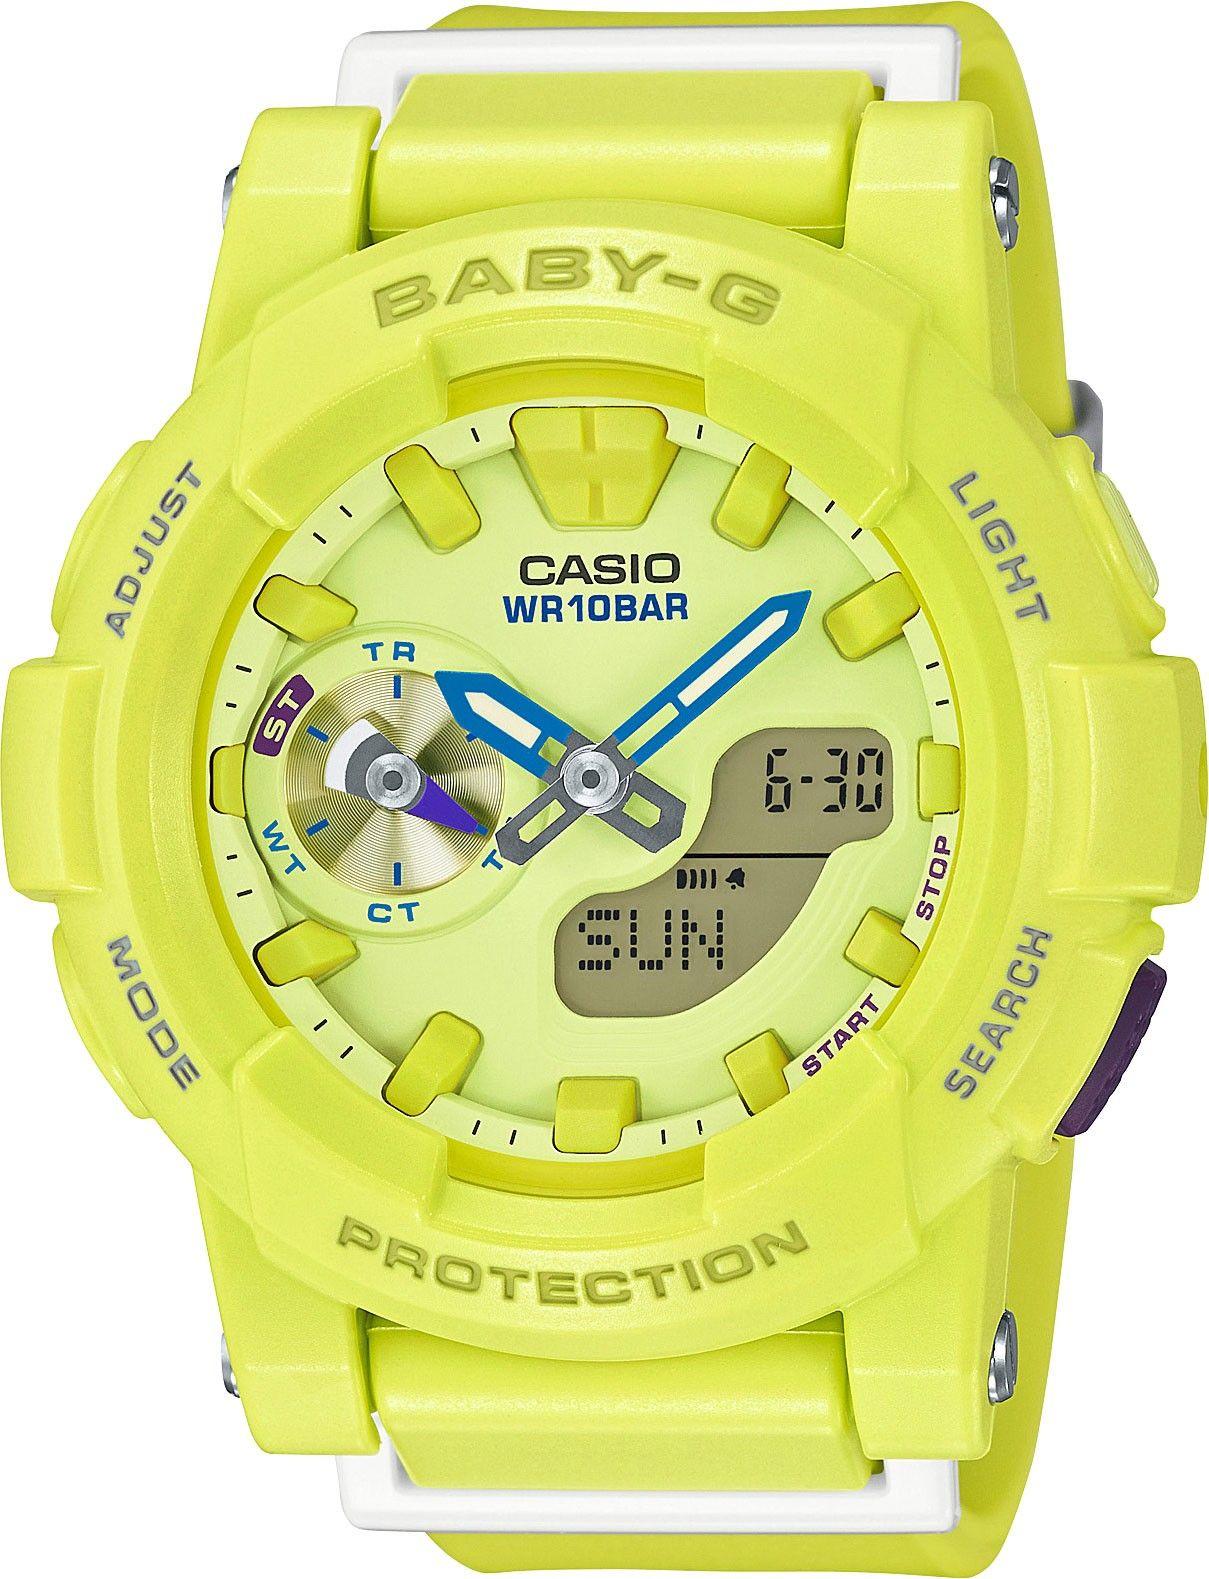 Zegarek Casio Baby G Quartz World Time Bga 185 9aer With Images